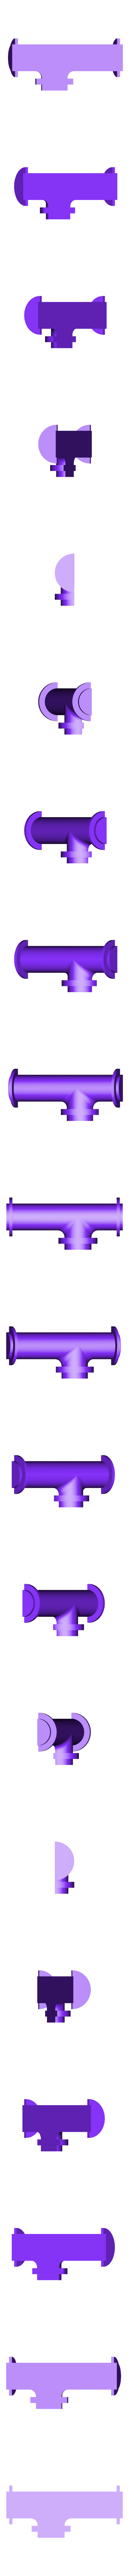 Steam_Pipe_T_pipe-b.STL Download free STL file 4-8-8-4 Big Boy Locomotive • 3D printer object, RaymondDeLuca